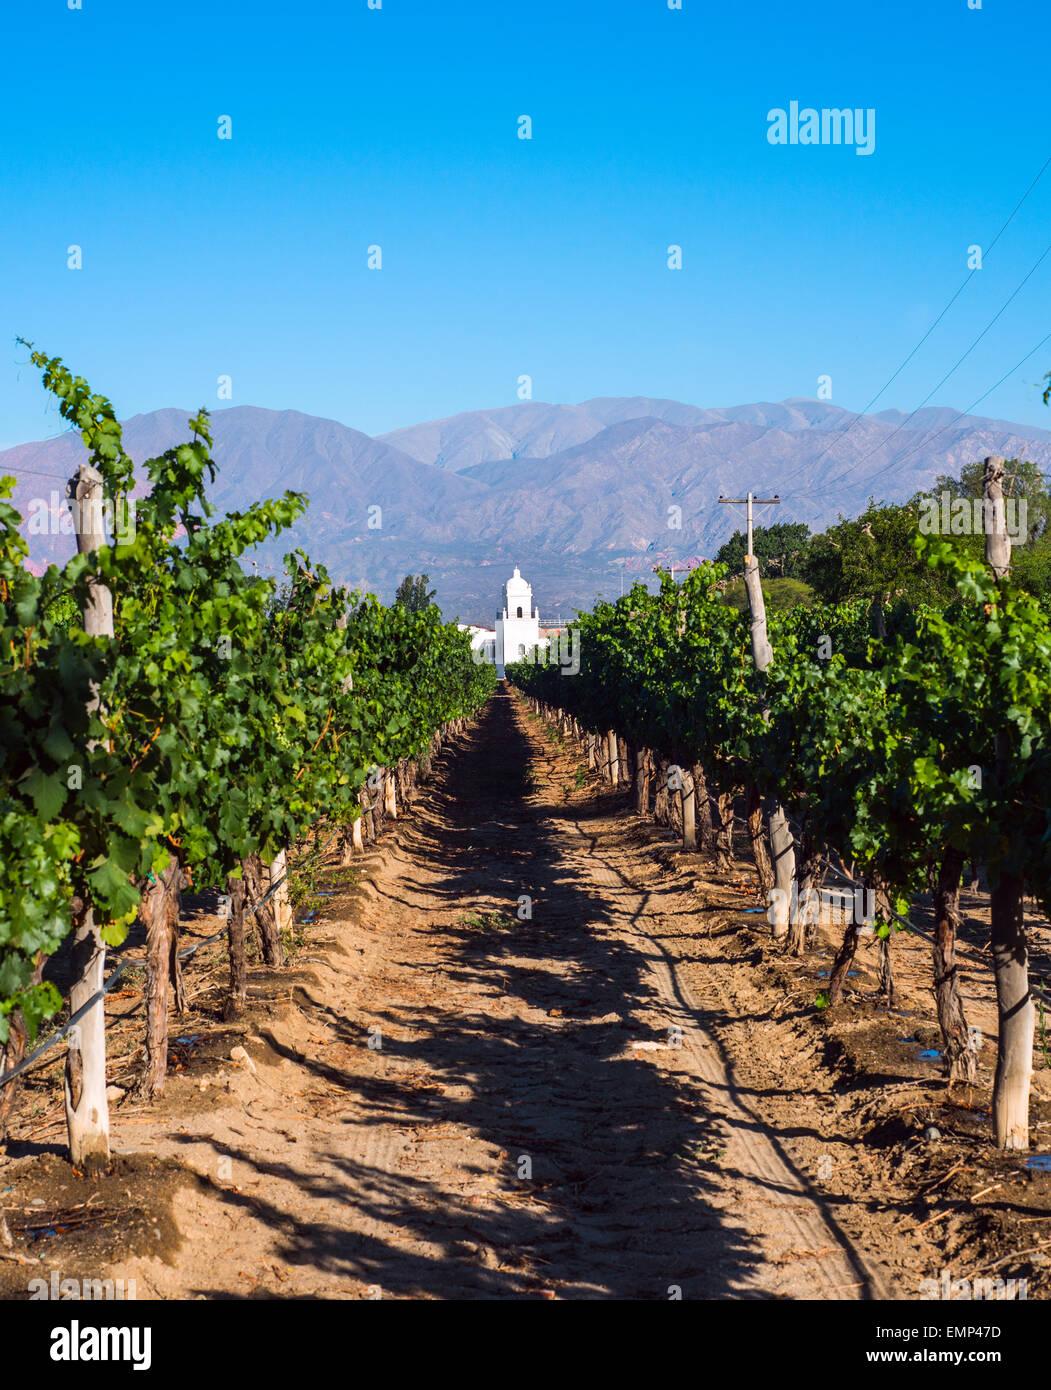 Vineyards in Cafayate, Argentina - Stock Image